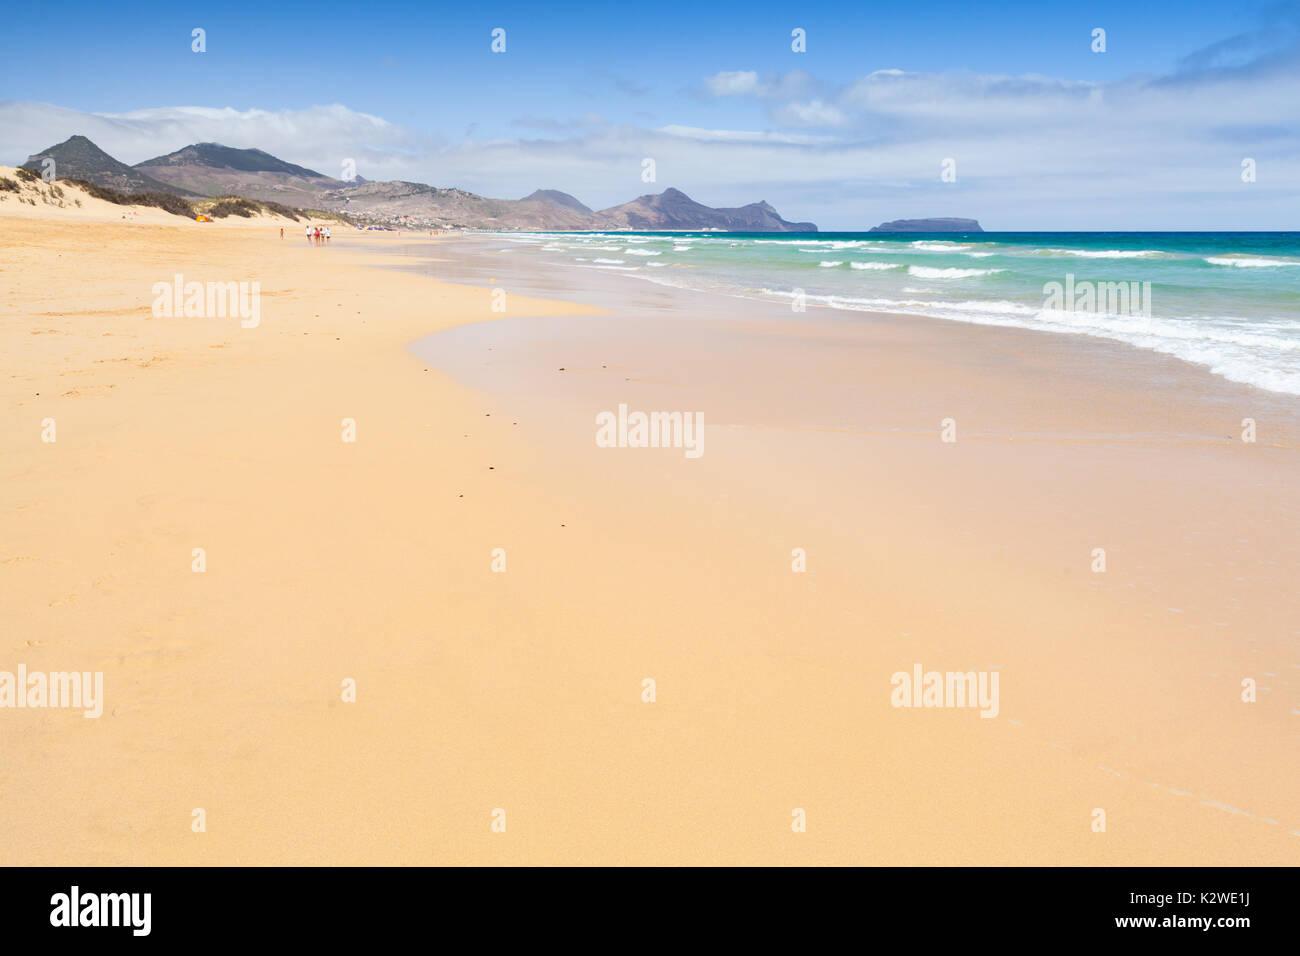 Sandy wide beach landscape of the island of Porto Santo in the Madeira archipelago, Portugal - Stock Image